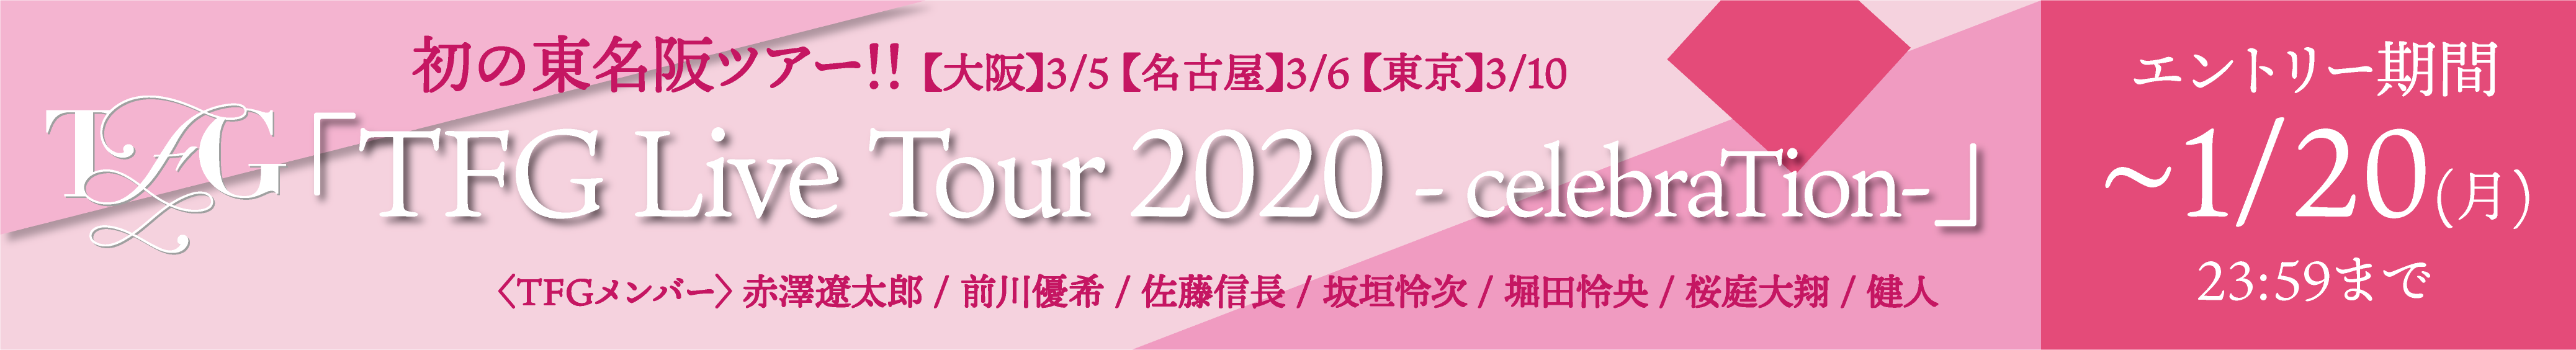 「TFG Live Tour 2020 - celebraTion-」MEMBER'S SITE有料会員先行スタート!